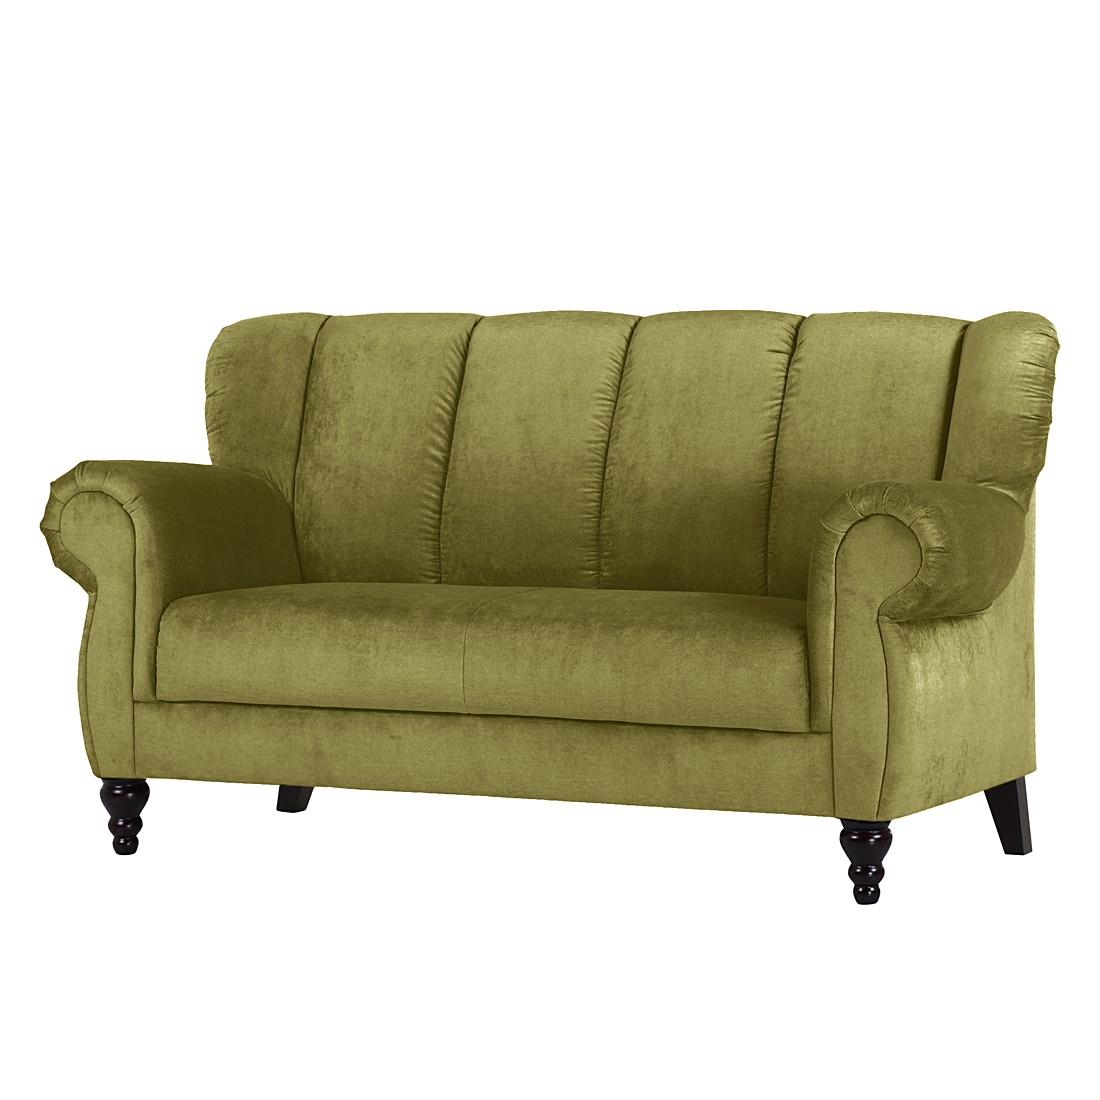 Diningsofa Comodo I (2-Sitzer) – Microfaser Dunkelgrün, Maison Belfort online bestellen